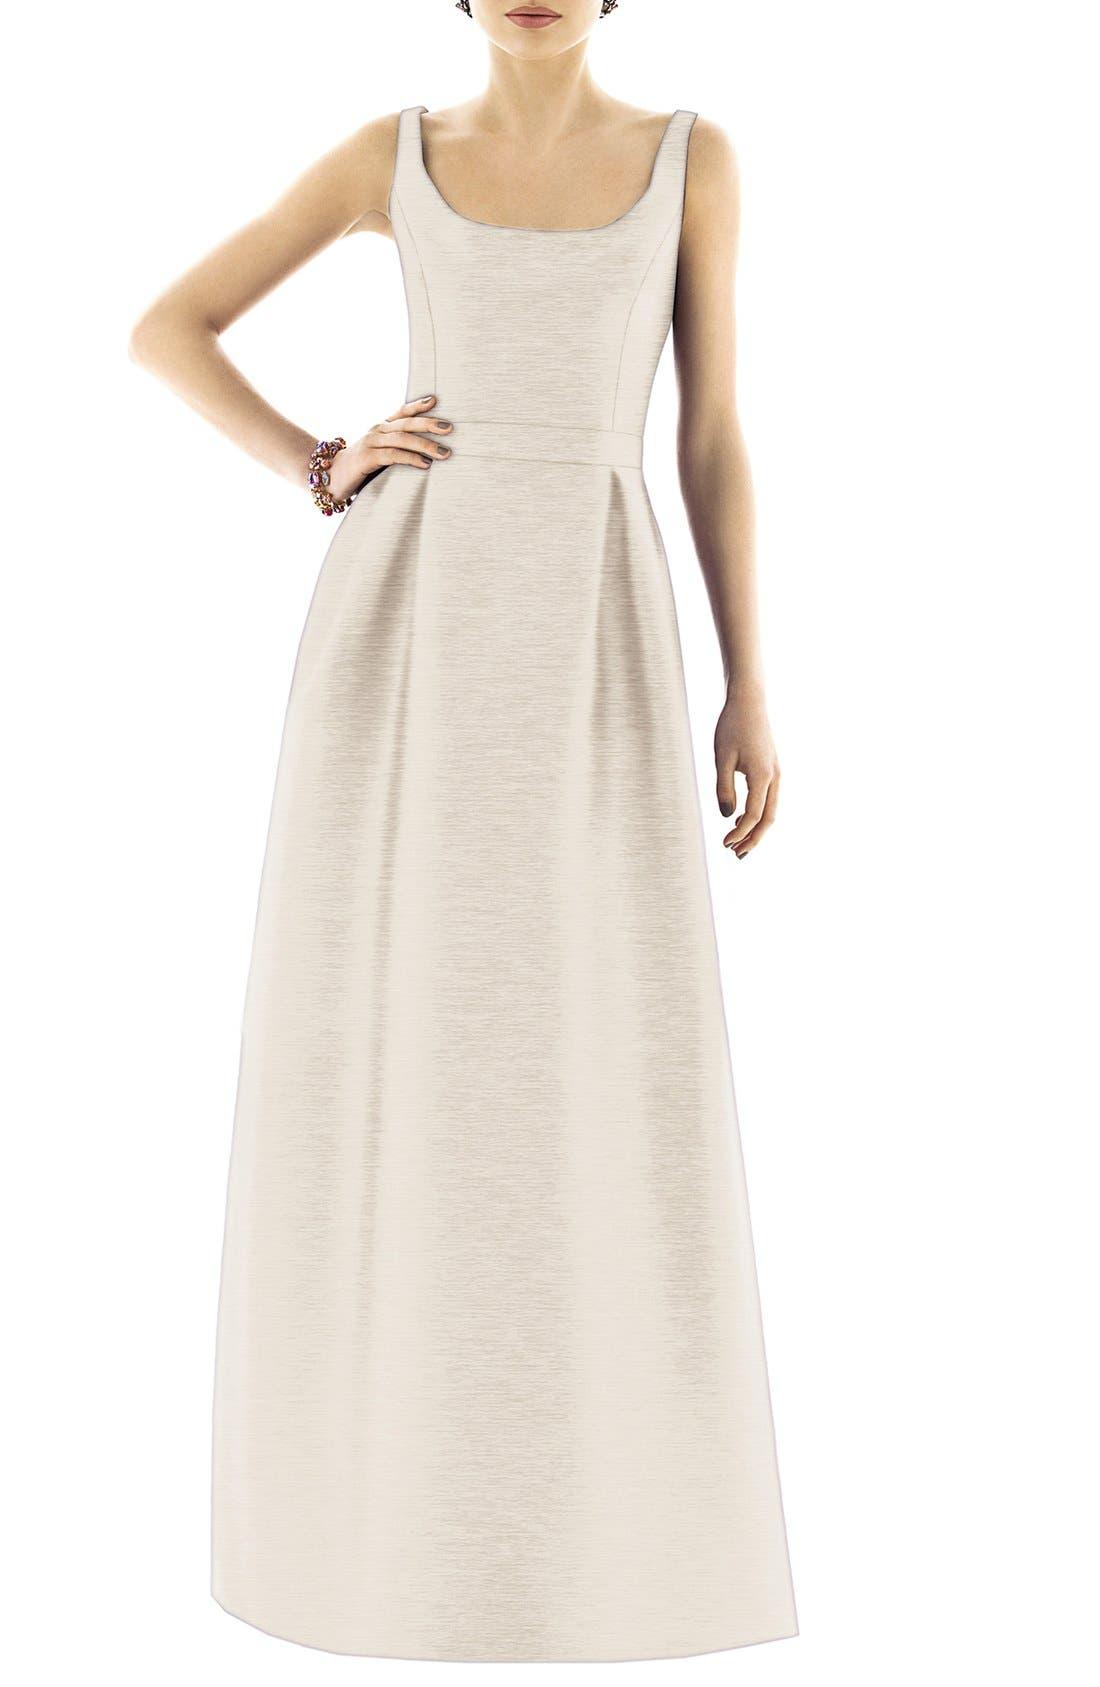 Scoop Neck Dupioni Full Length Dress,                             Alternate thumbnail 16, color,